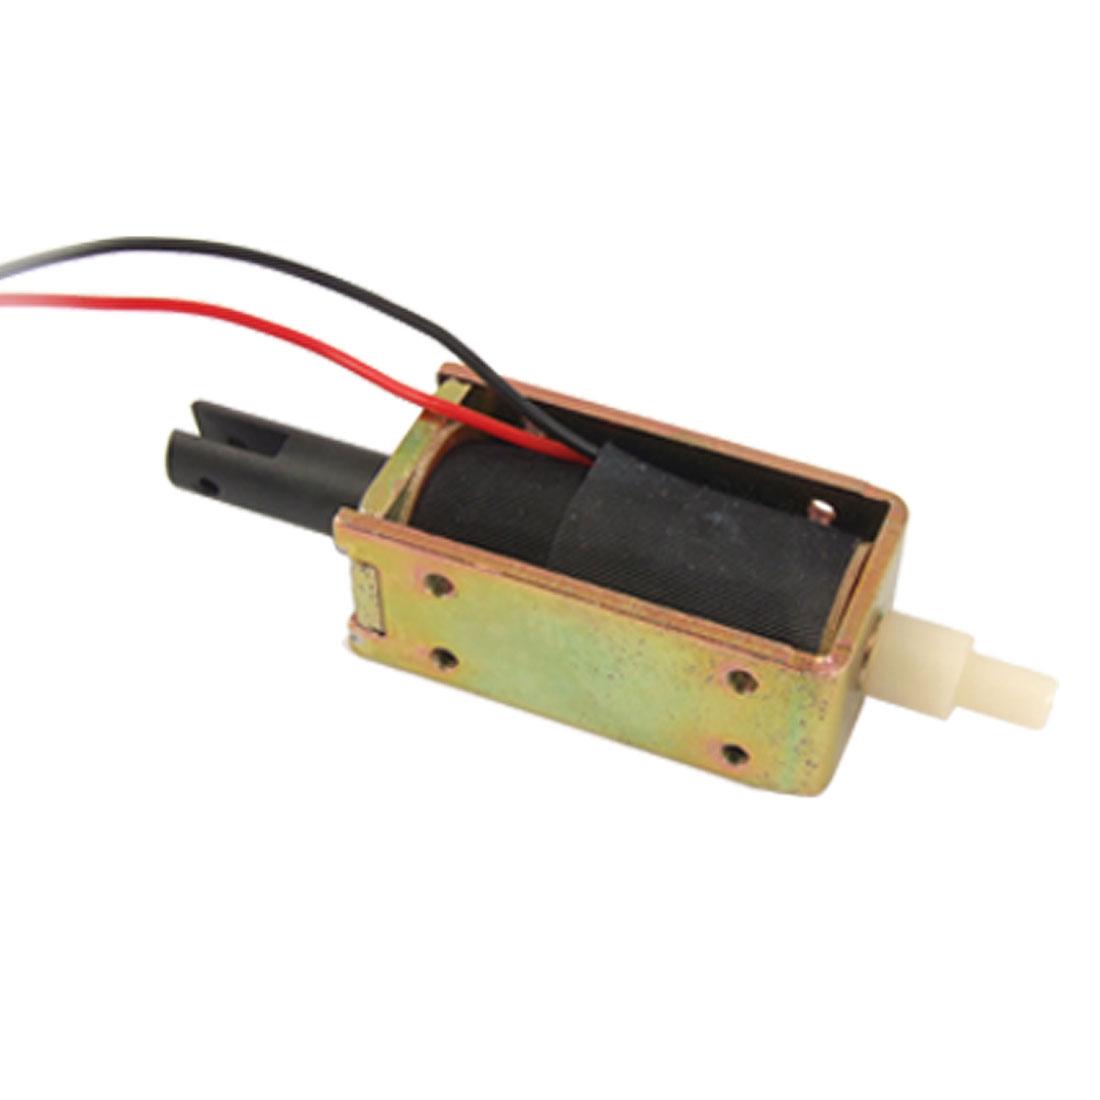 DC 24V 0.34A 5mm Stroke Open Frame Push Type Solenoid Electromagnet